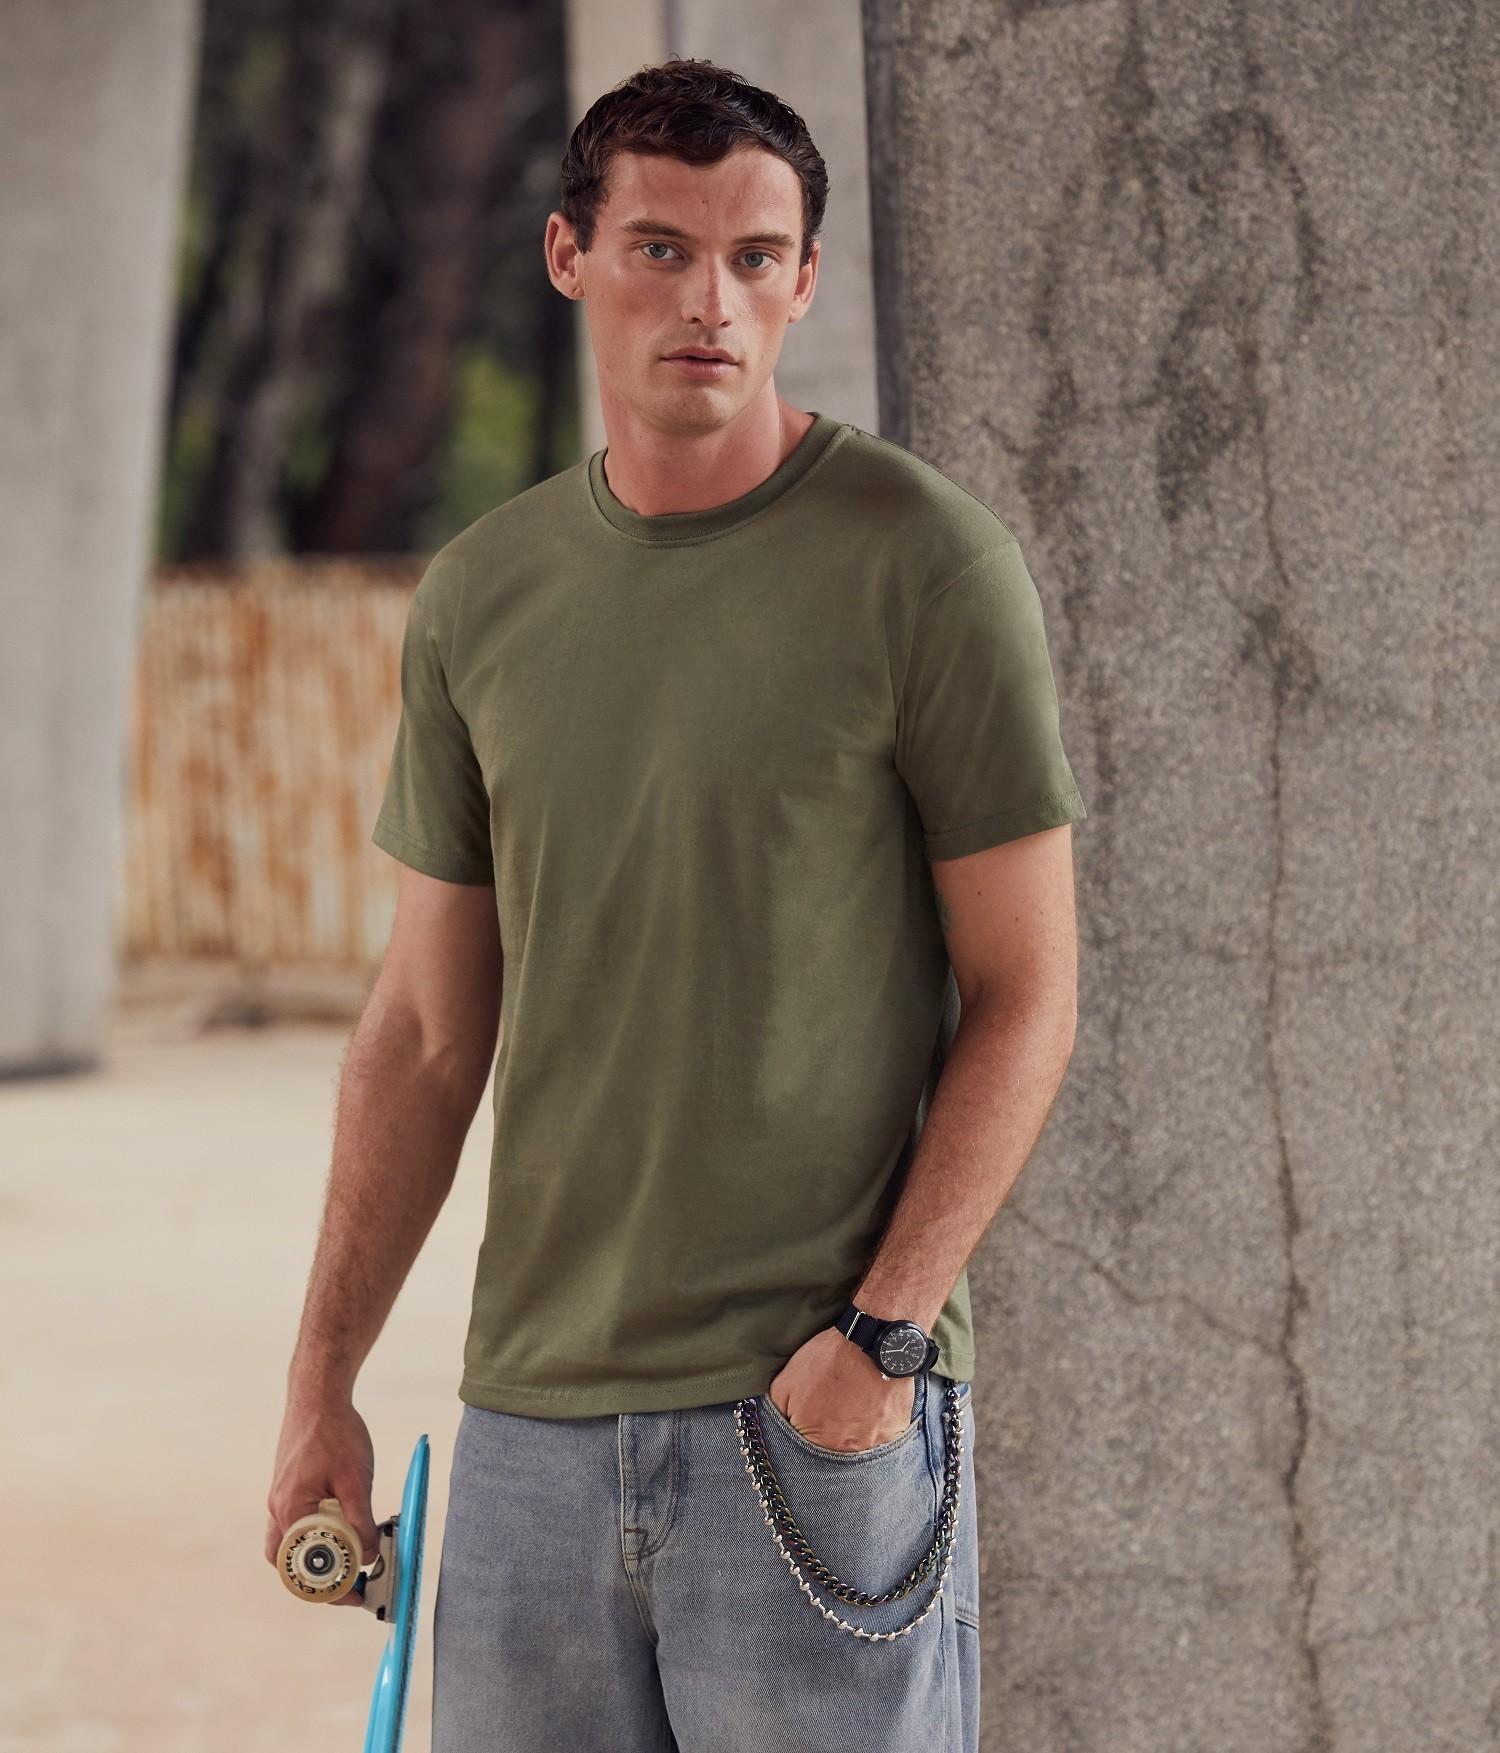 96dfa8efb T Shirt Printing - Design & Personalise Custom T Shirts | Banana Moon